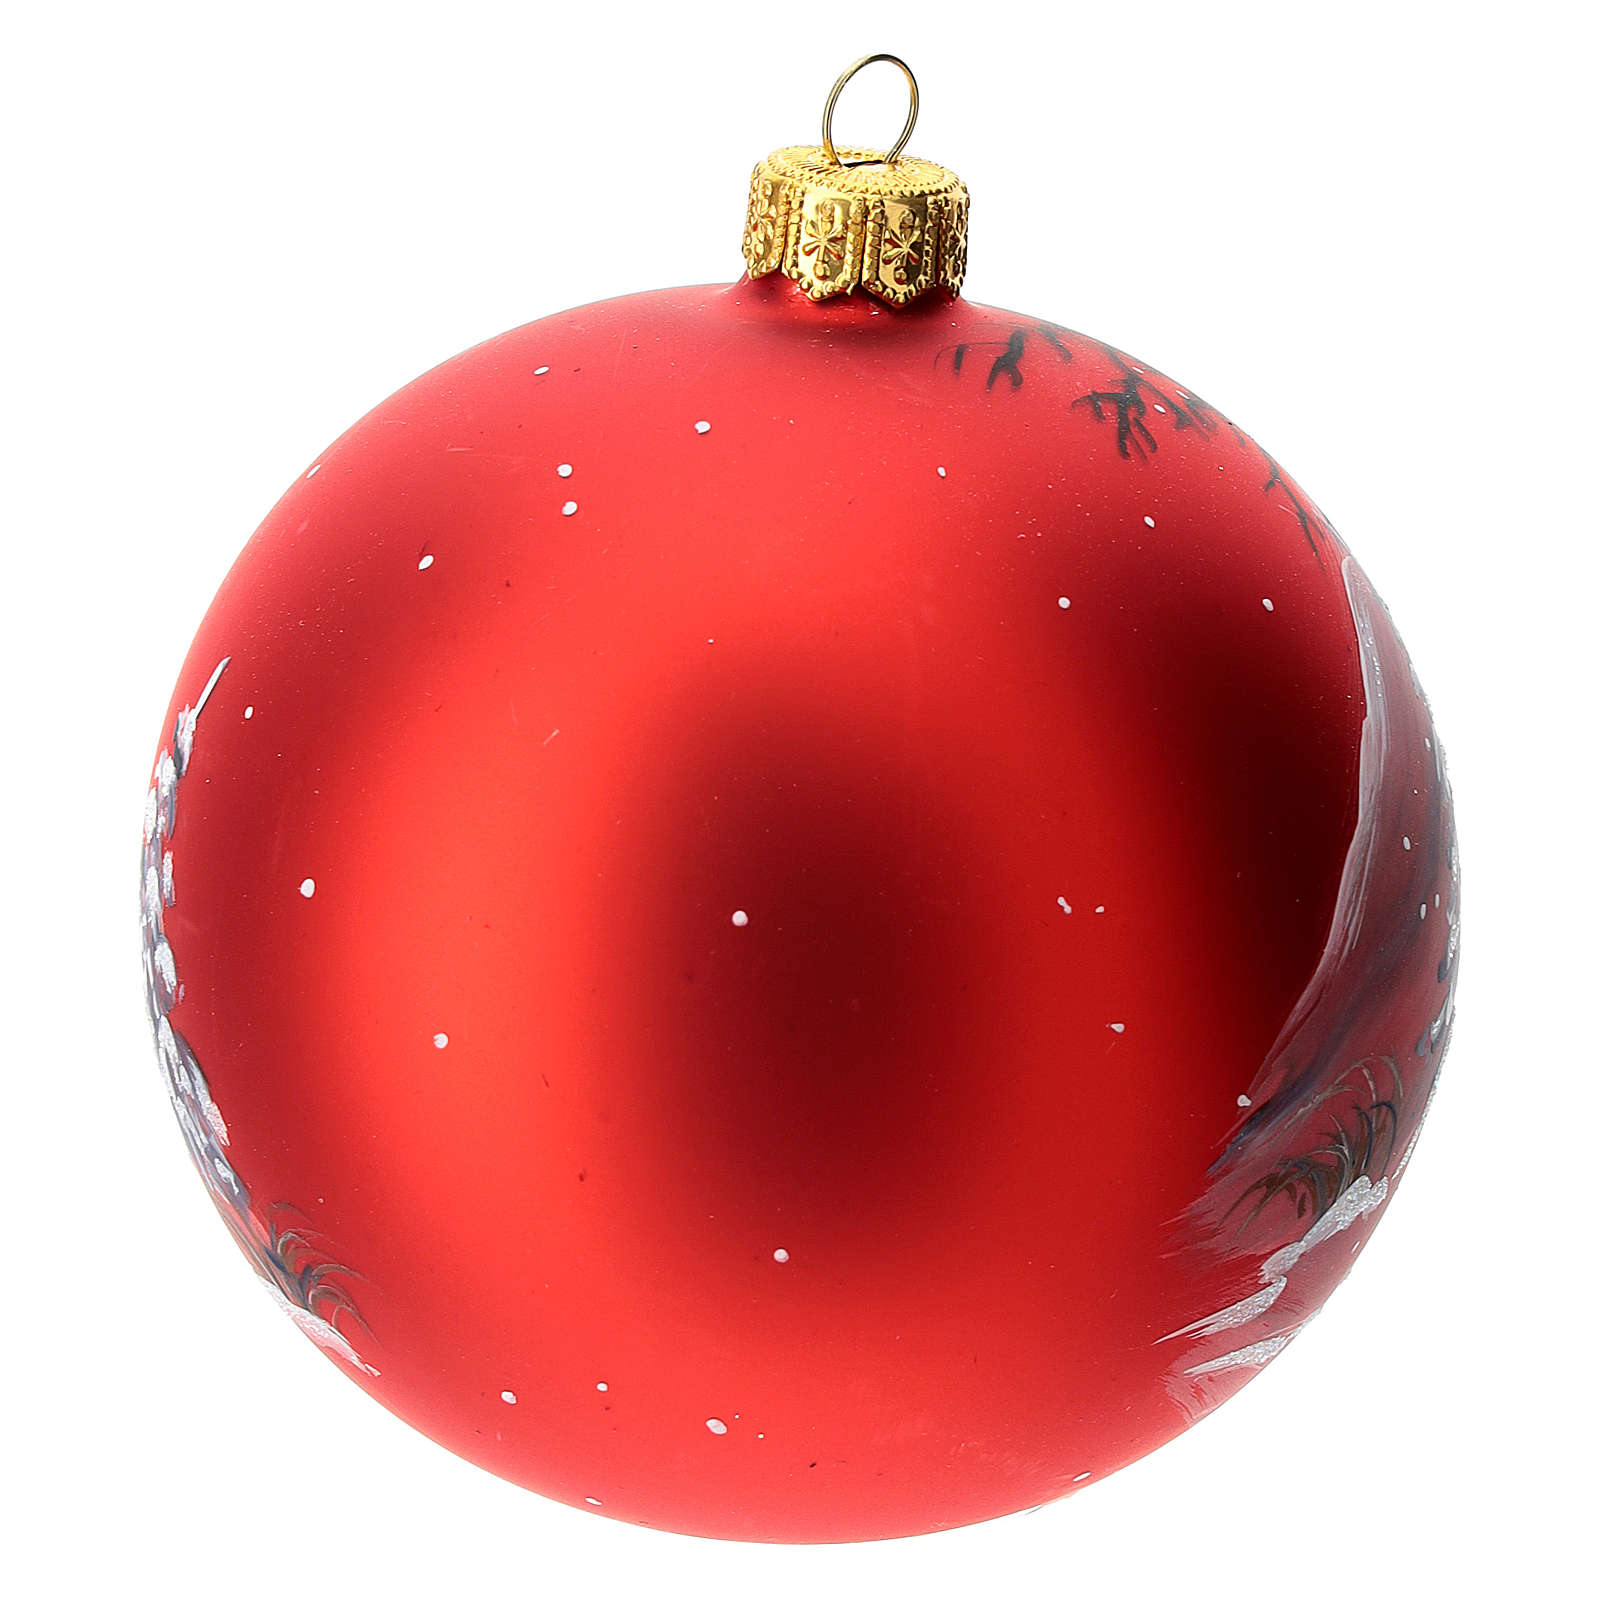 Bola árbol Navidad vidrio soplado roja reno navideño 100 mm 4